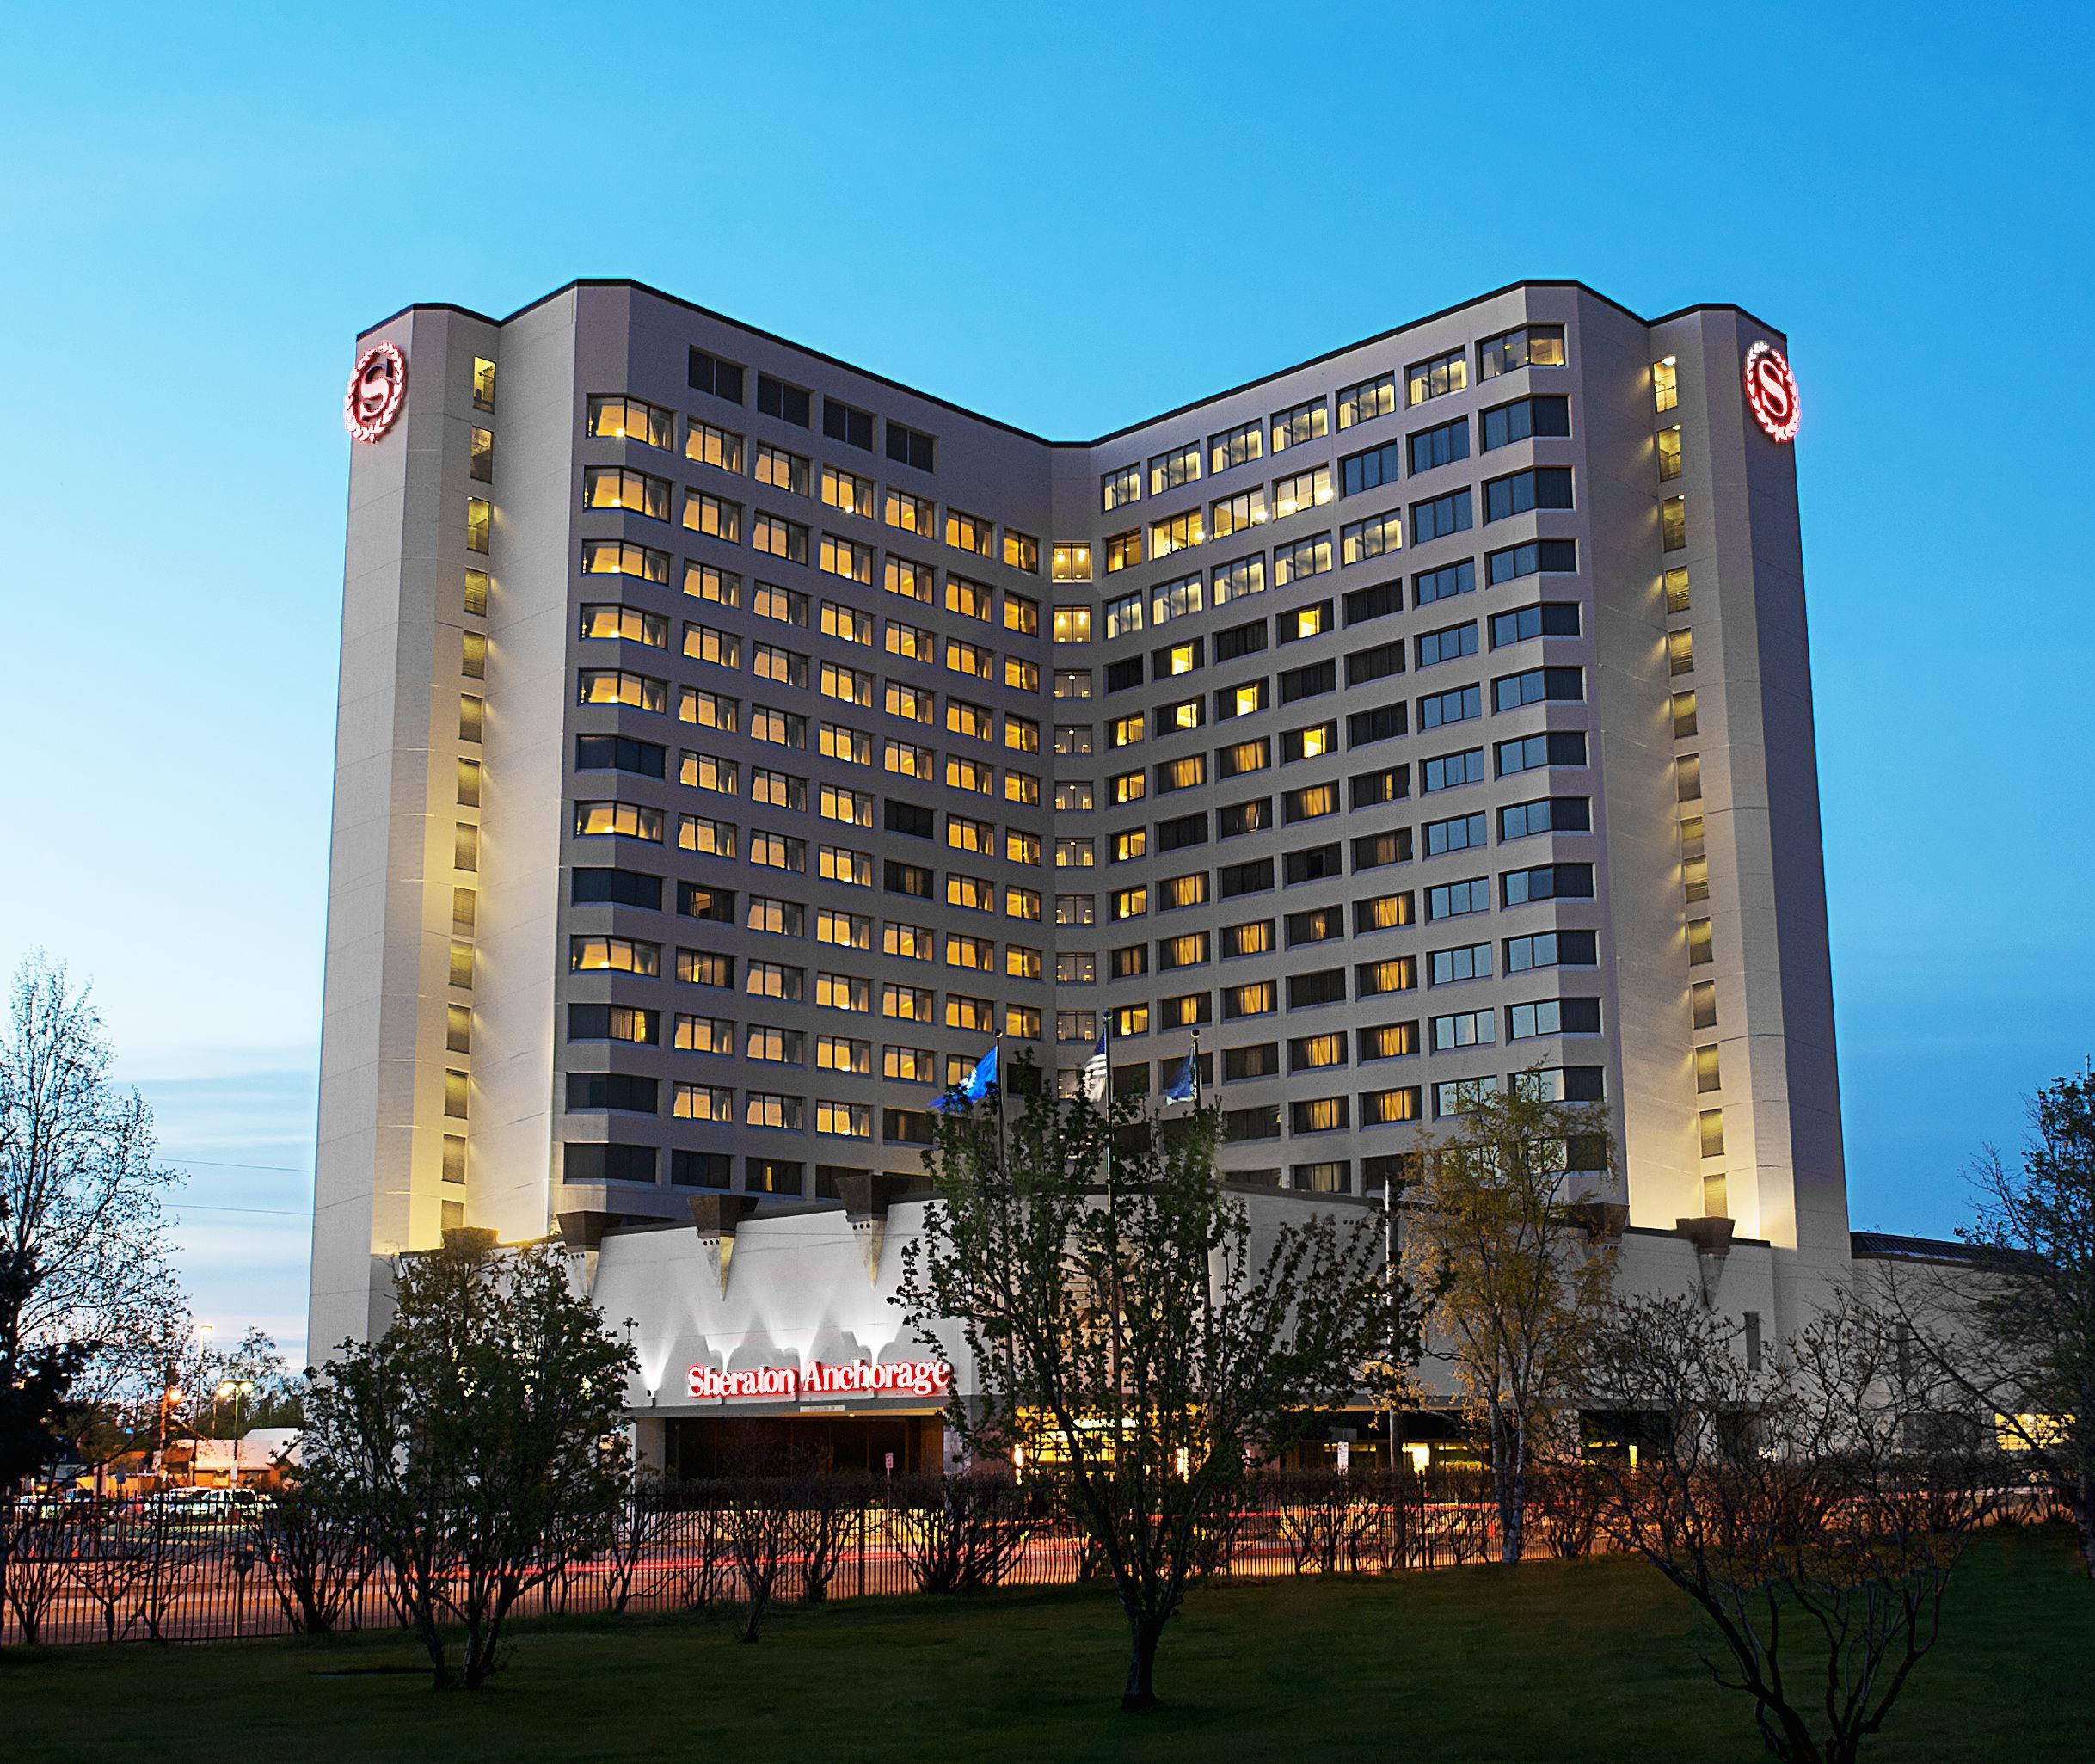 Sheraton Anchorage Hotel & Spa image 0